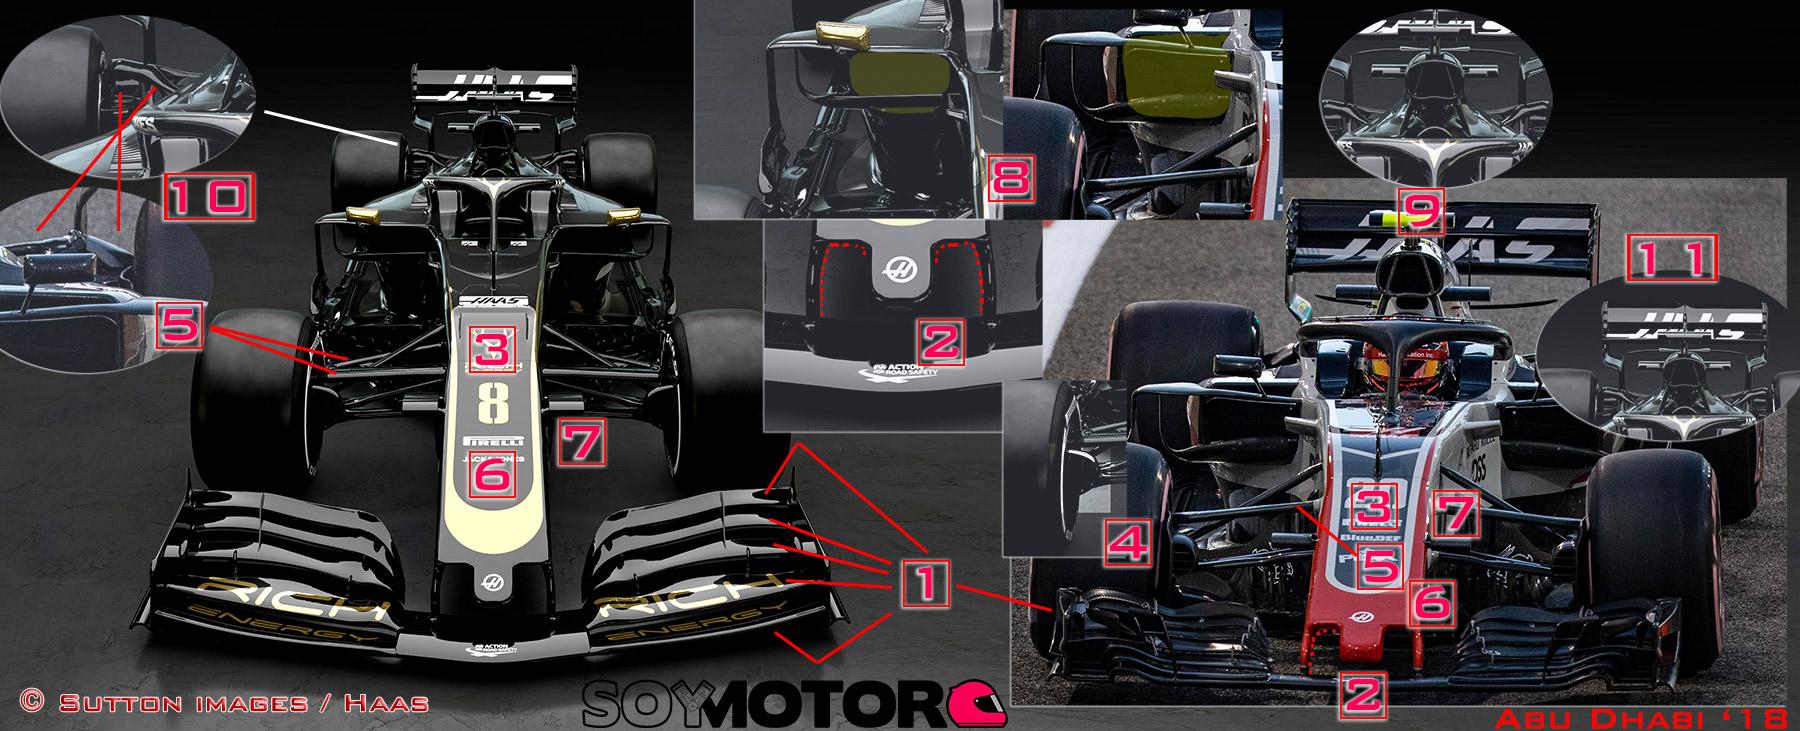 haas-vf19-vista-frontal-soymotor.jpg